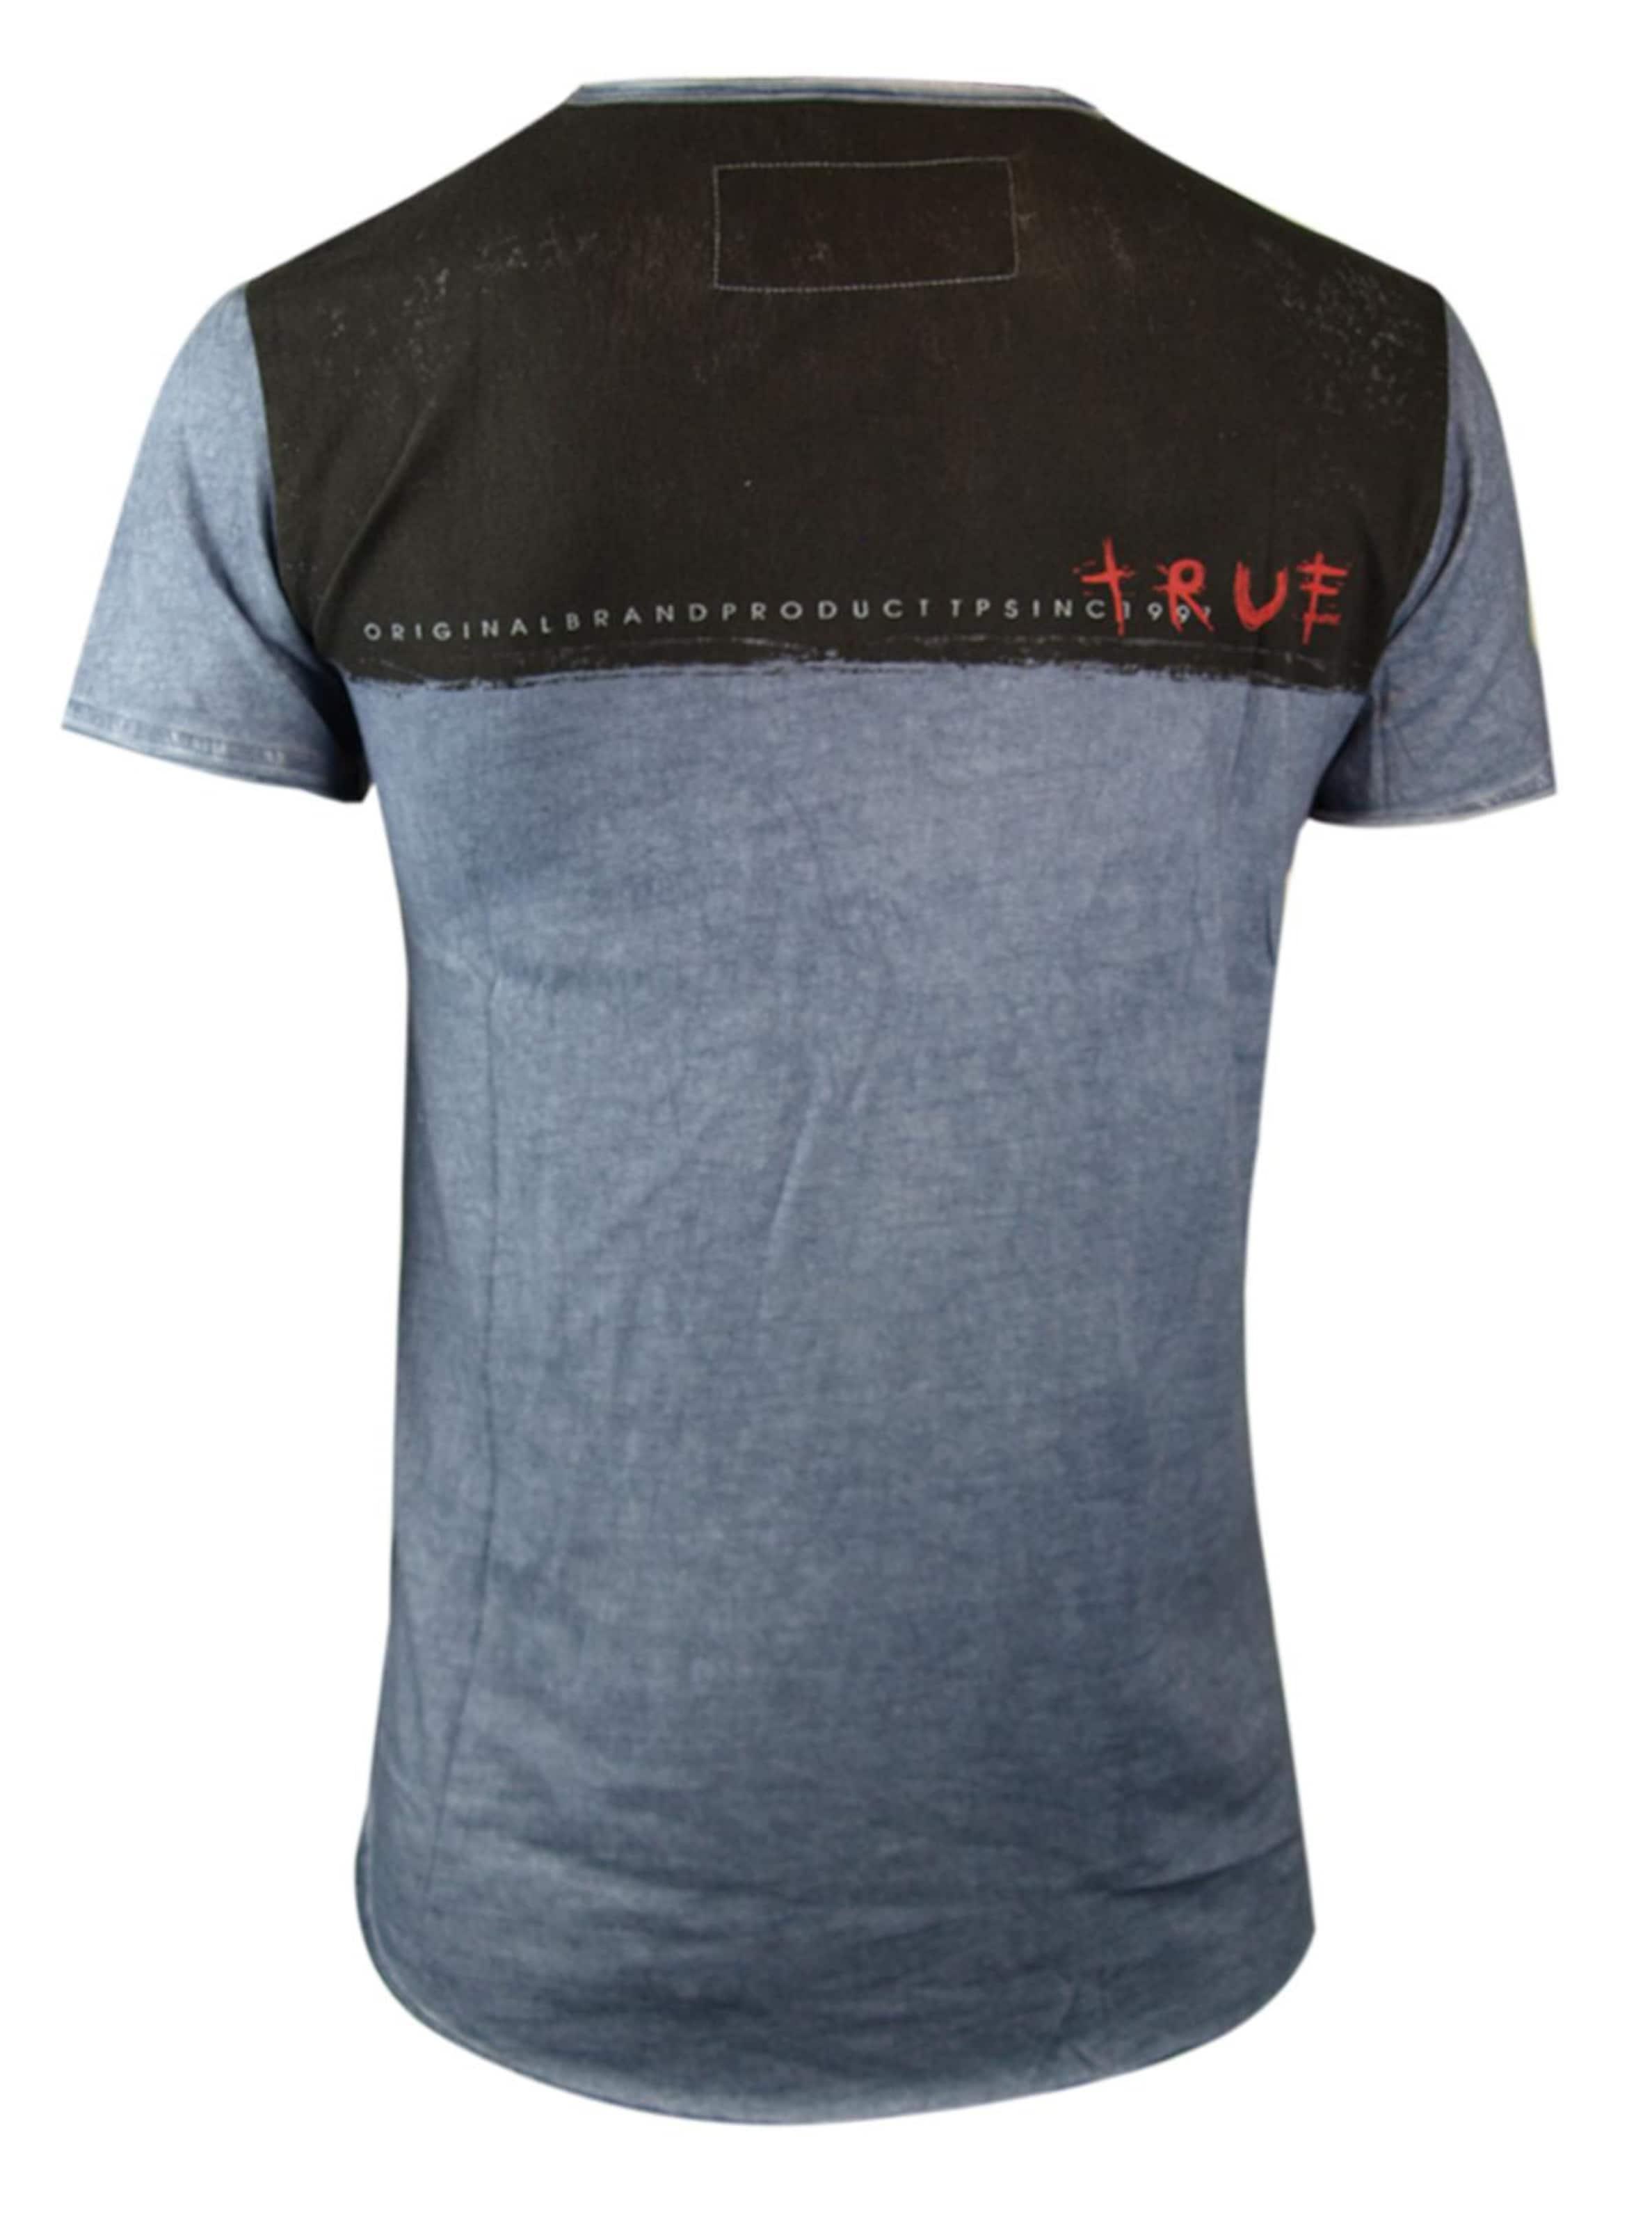 T Blau Trueprodigy In In Trueprodigy T shirt Trueprodigy shirt T shirt Blau yYbf76g